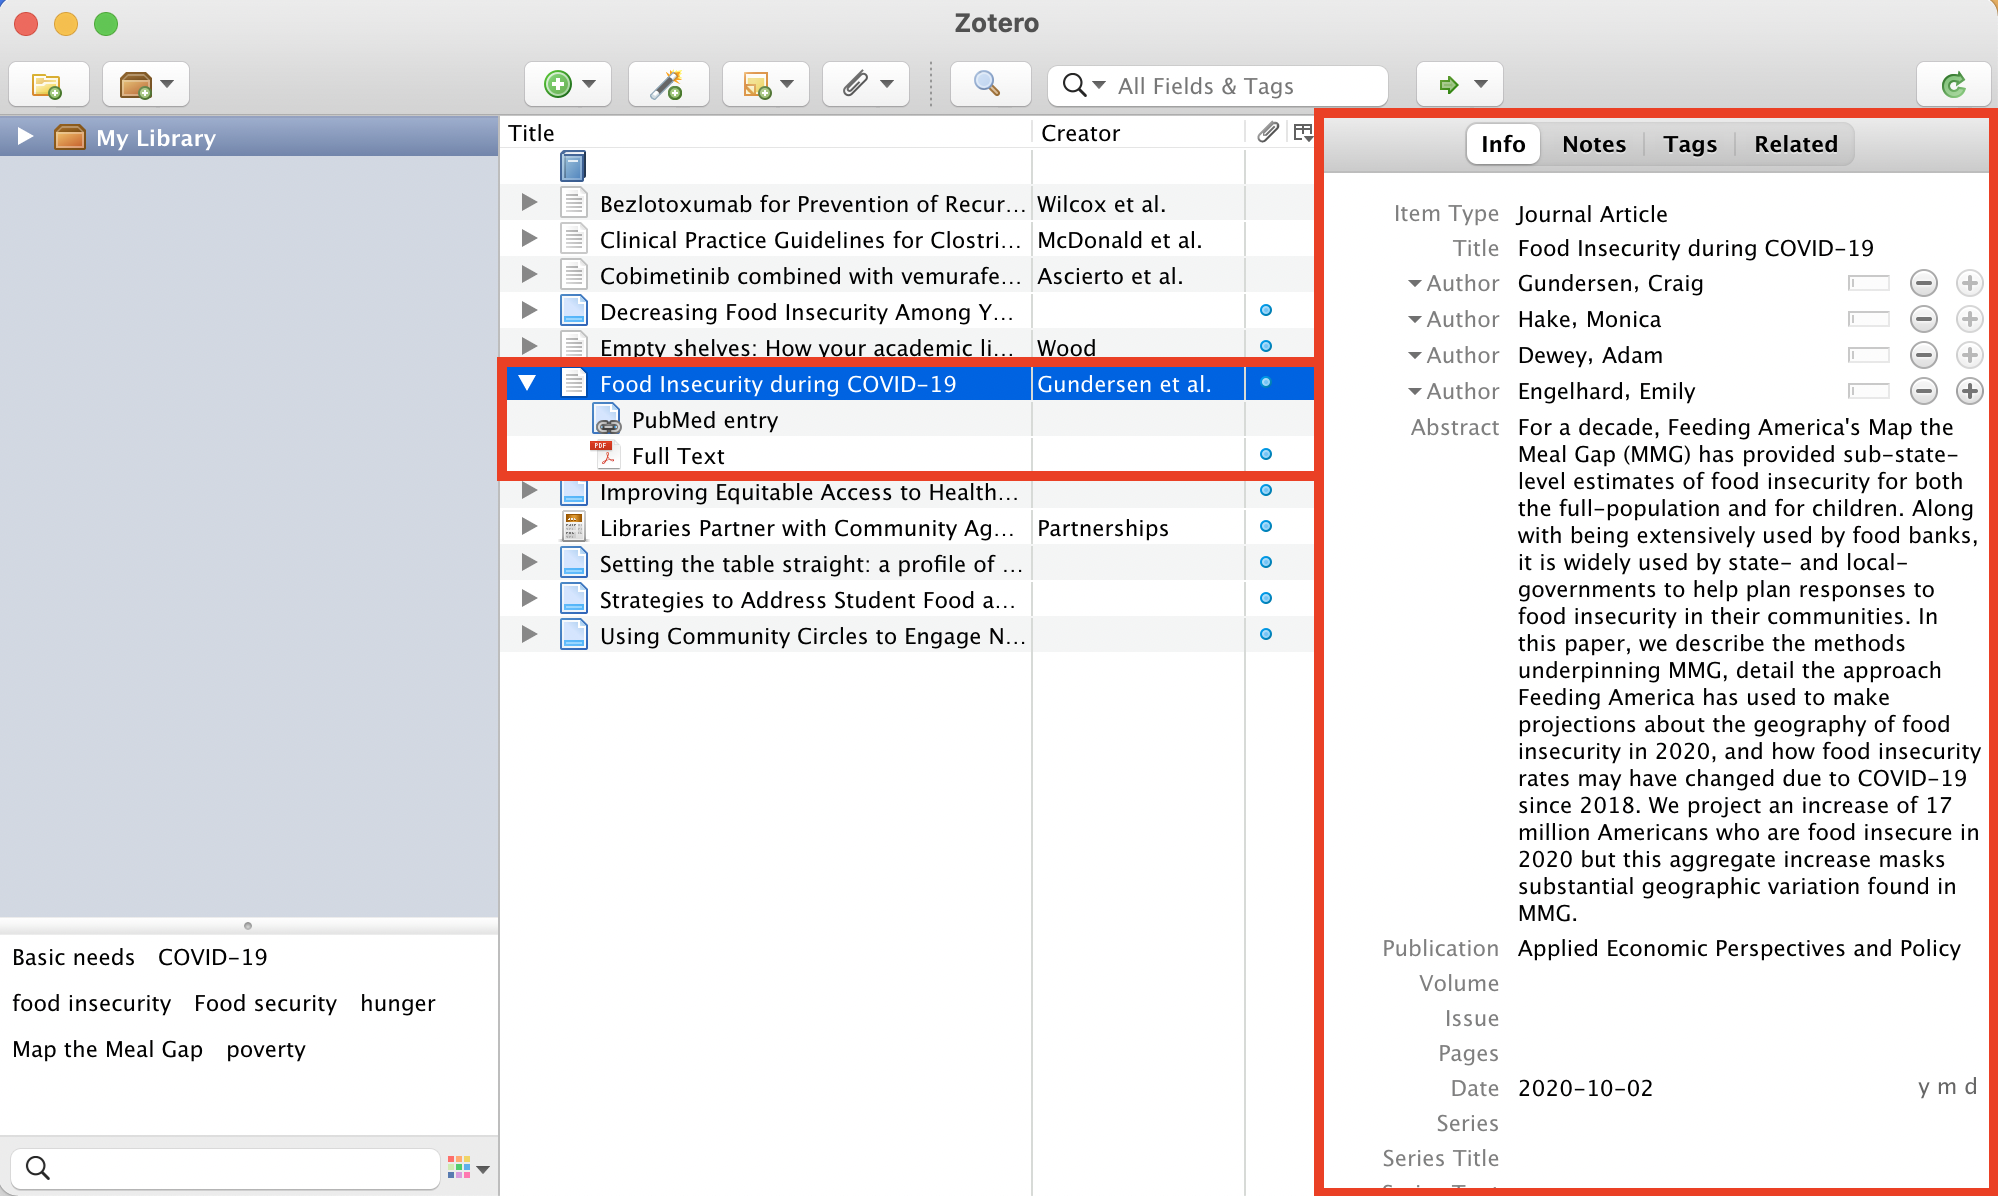 Zotero saved PDF file